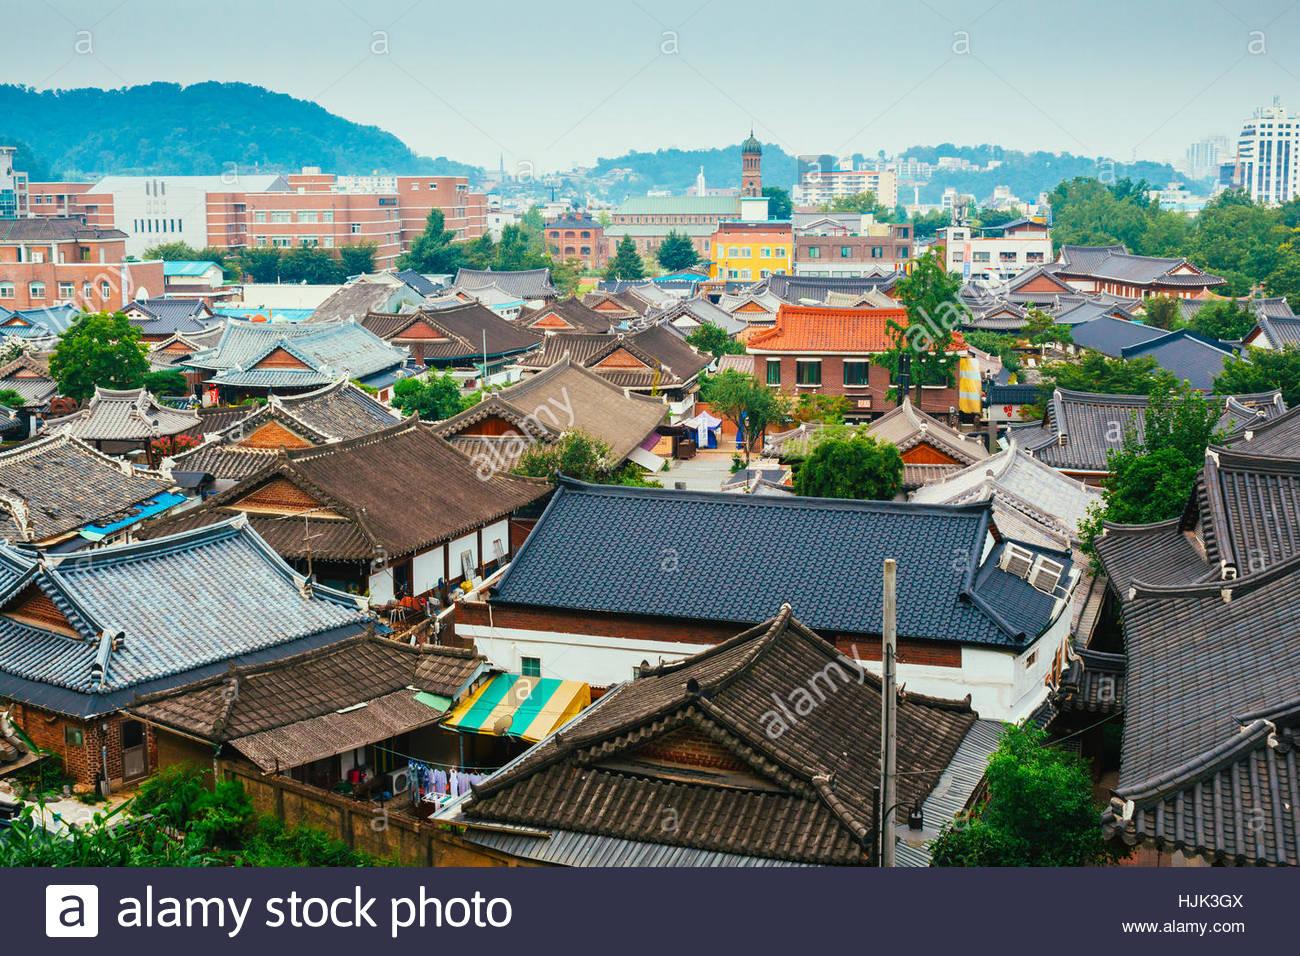 Jeonju, Korea   August 16, 2015 : Korean Traditional Roofing Tile House In  Jeonju Hanok Village